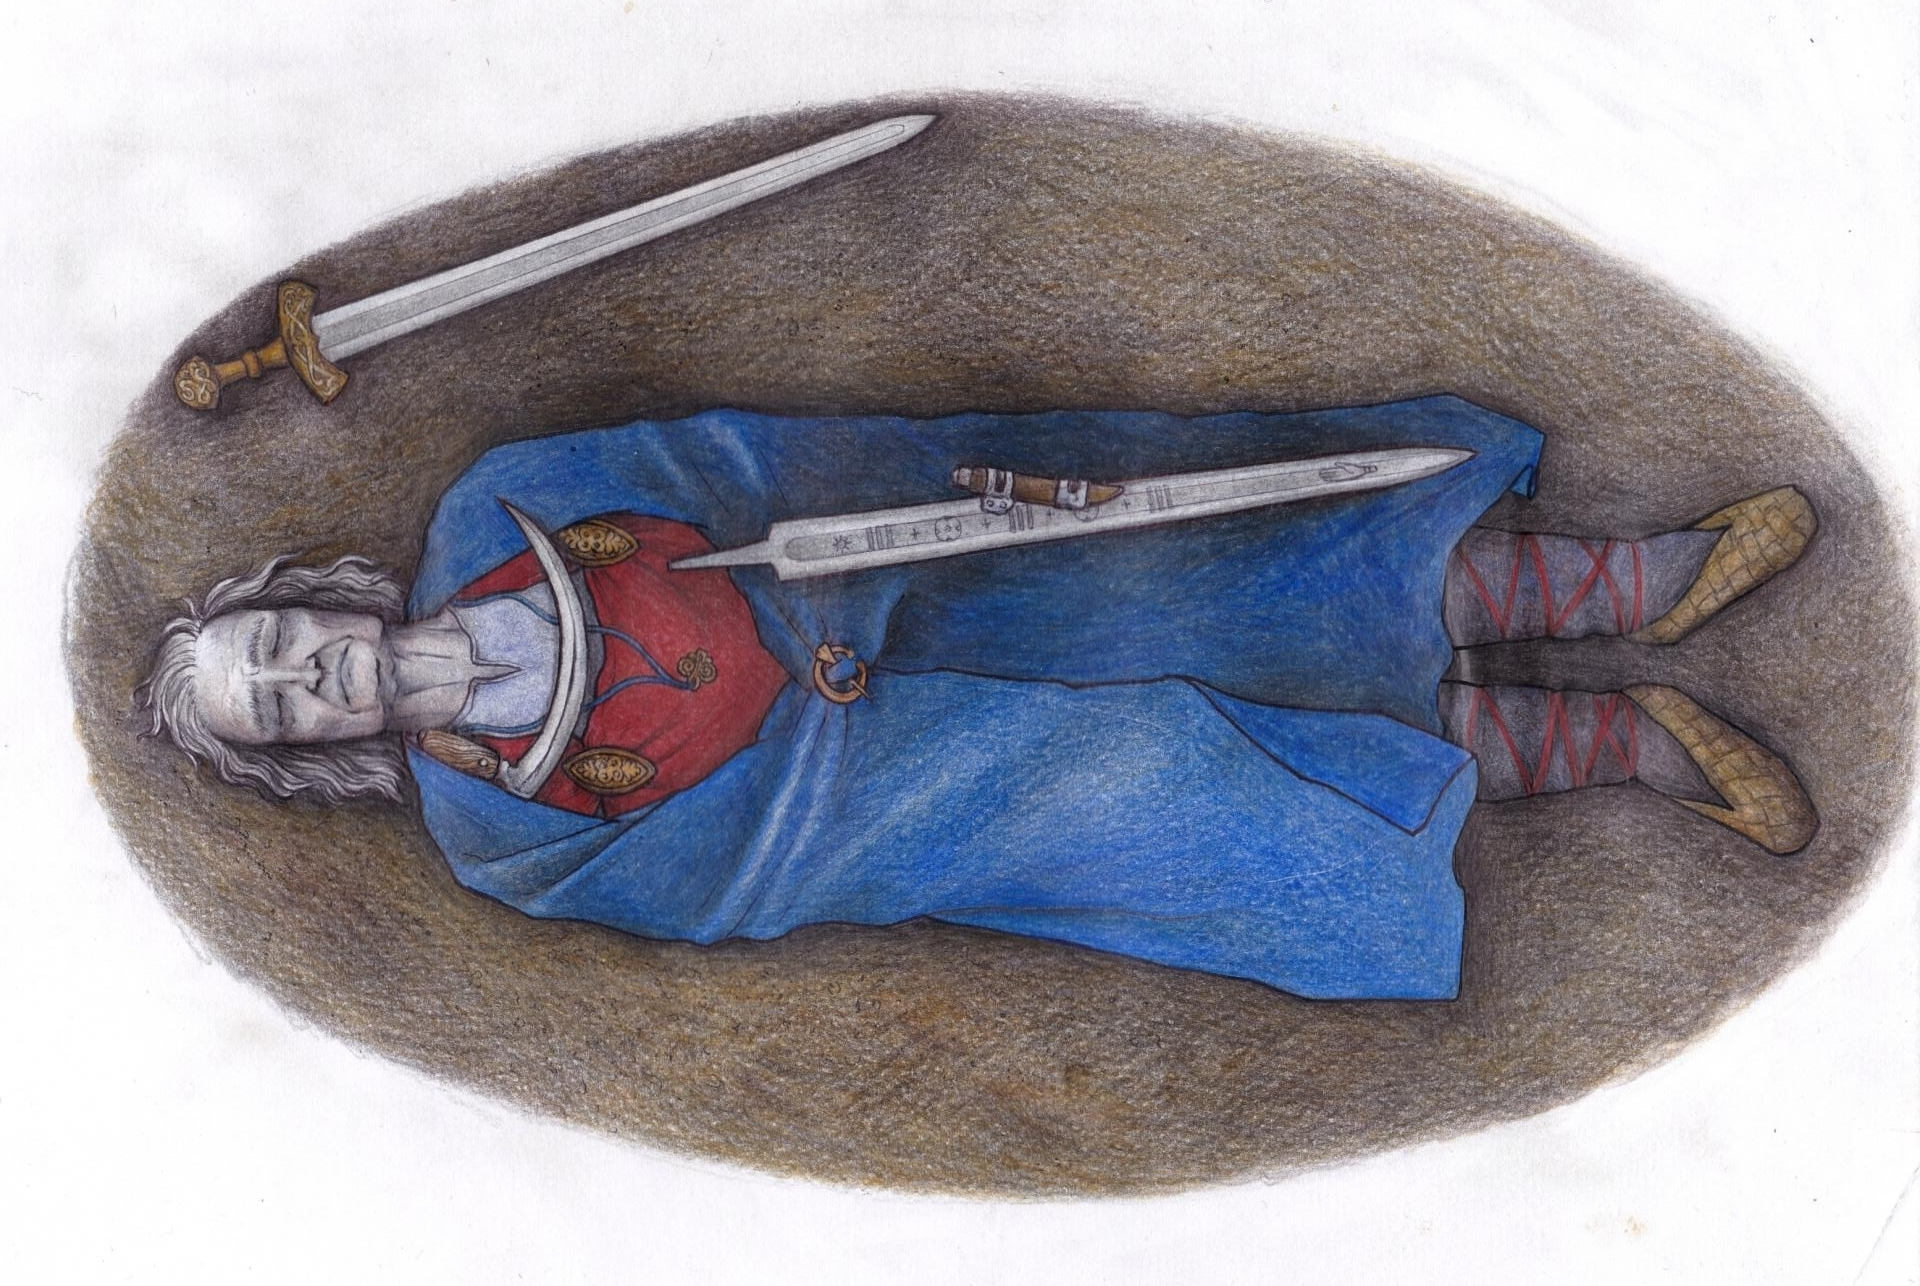 Finlande - Reconstitution de la tombe de Suontaka - Illustration: Veronika Paschenko